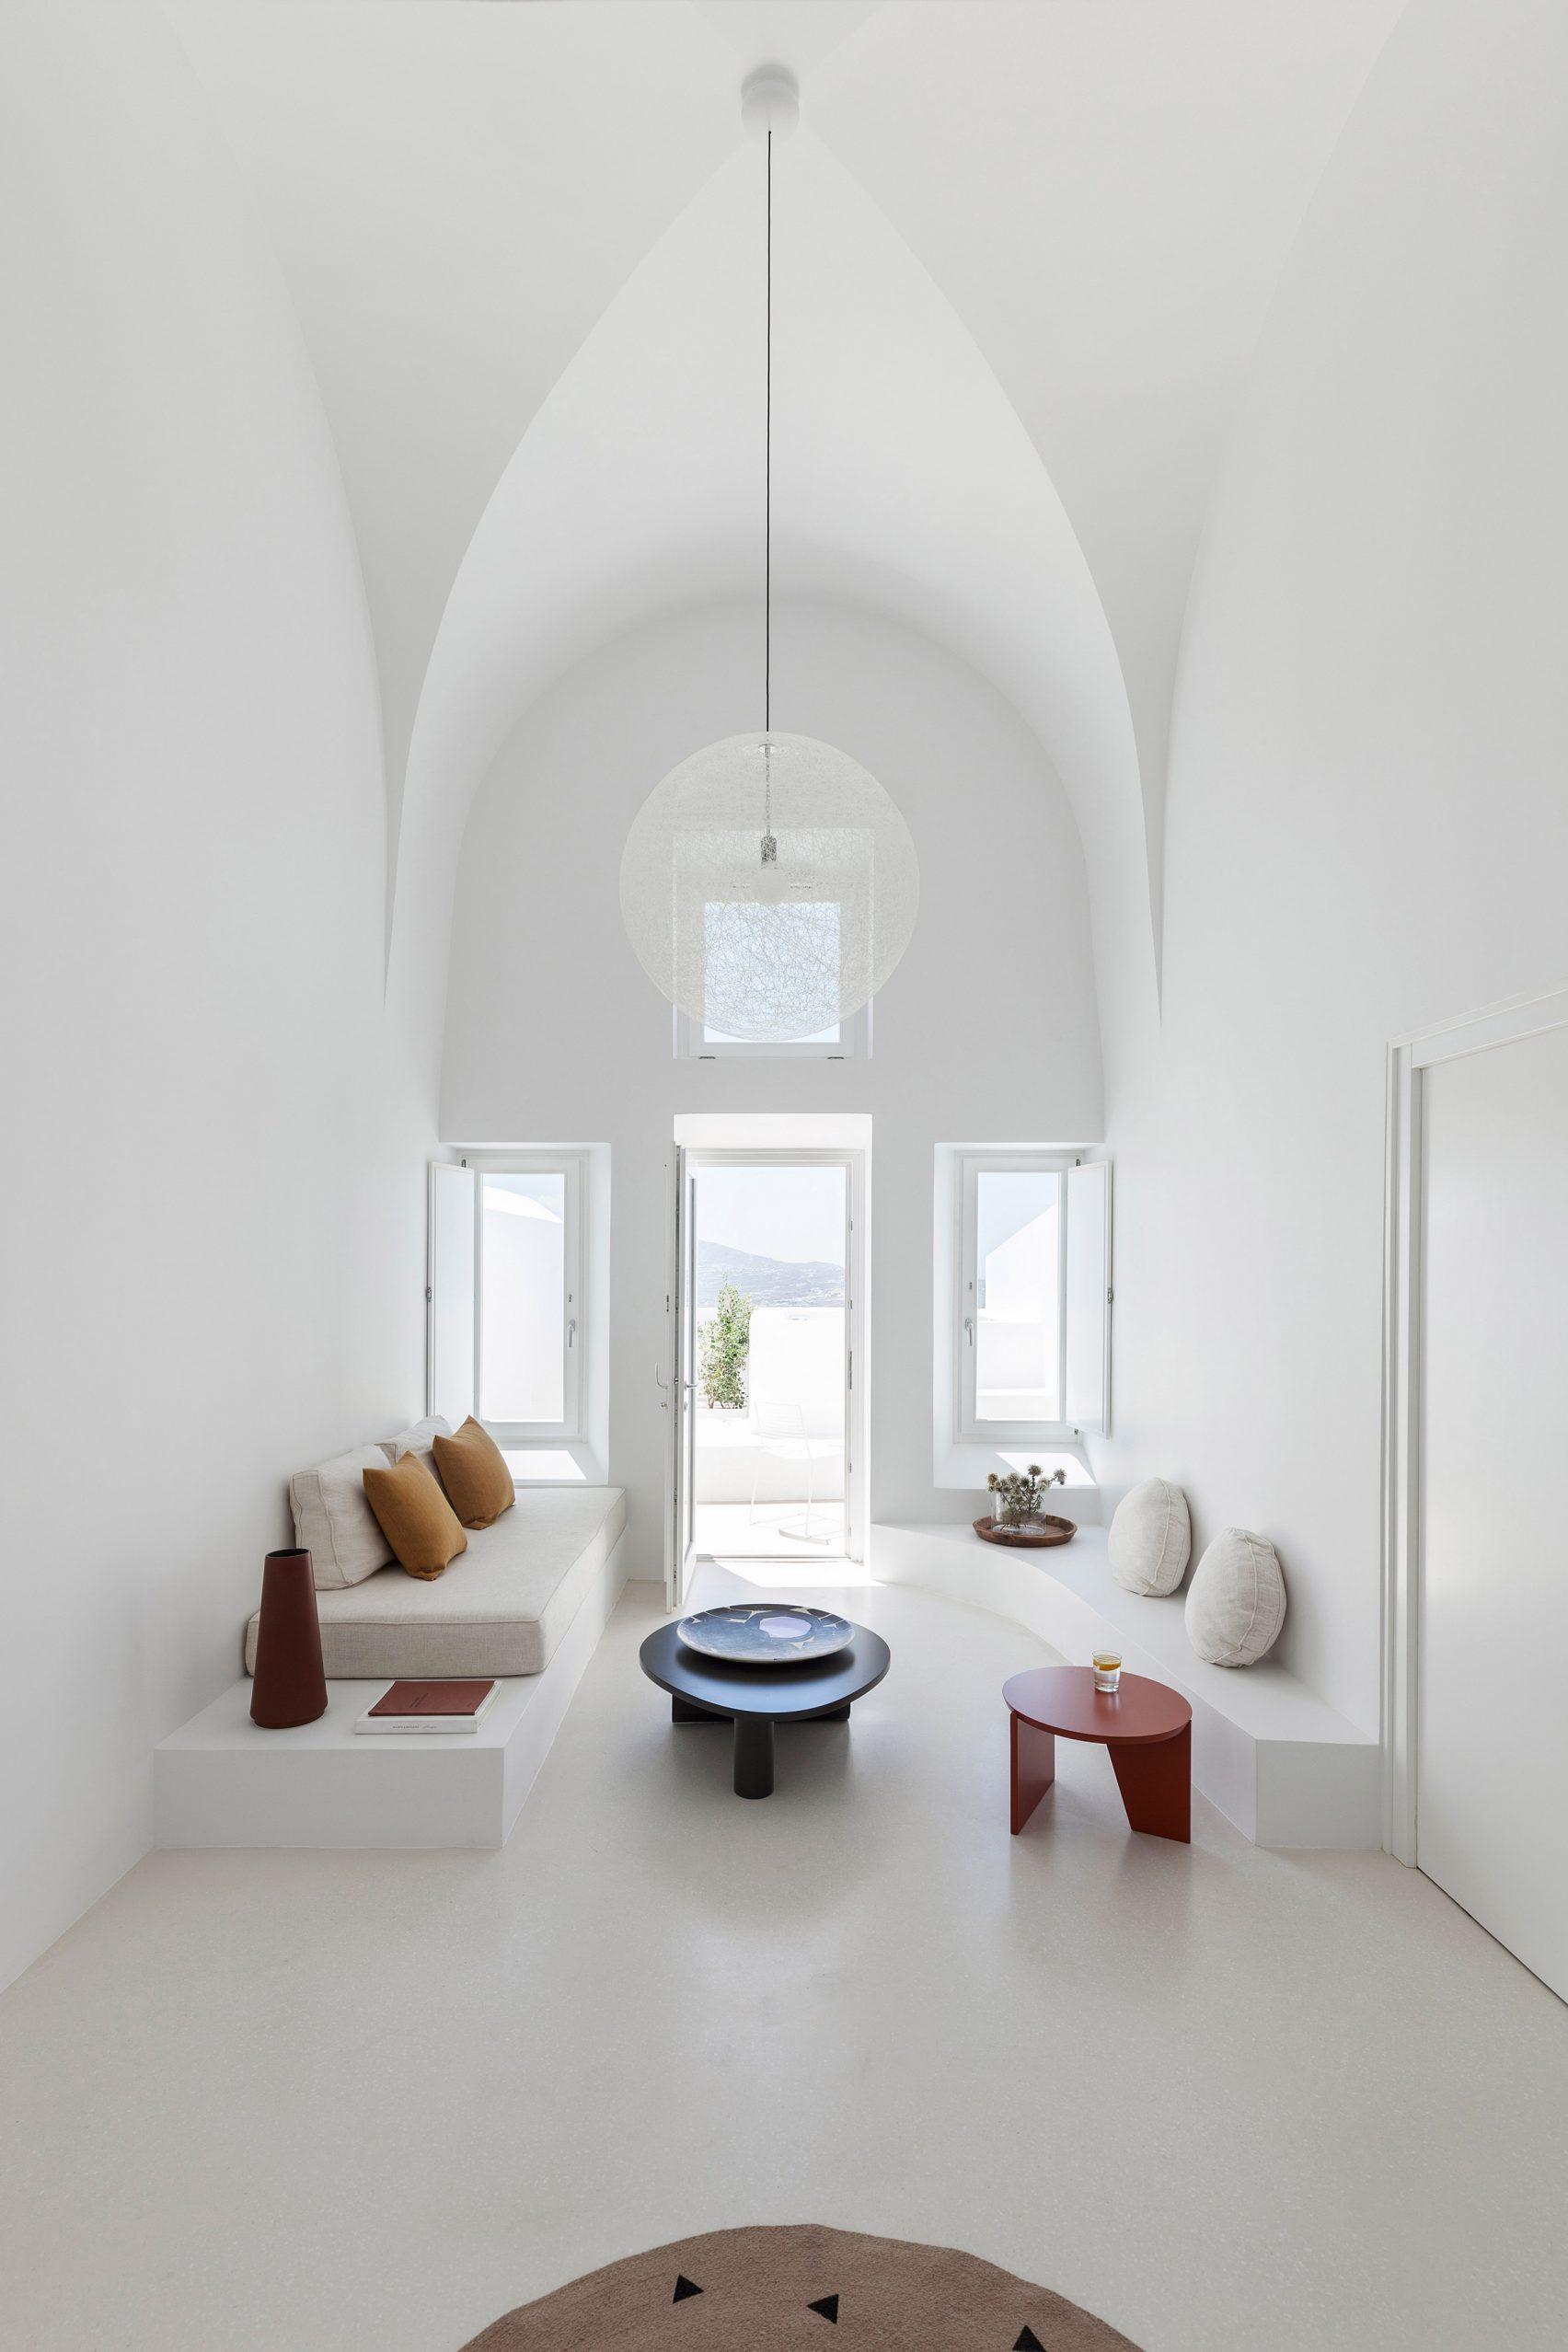 summer-residence-santorini-kapsimalis-architects-greece-architecture_dezeen_2364_col_16-1704x2556